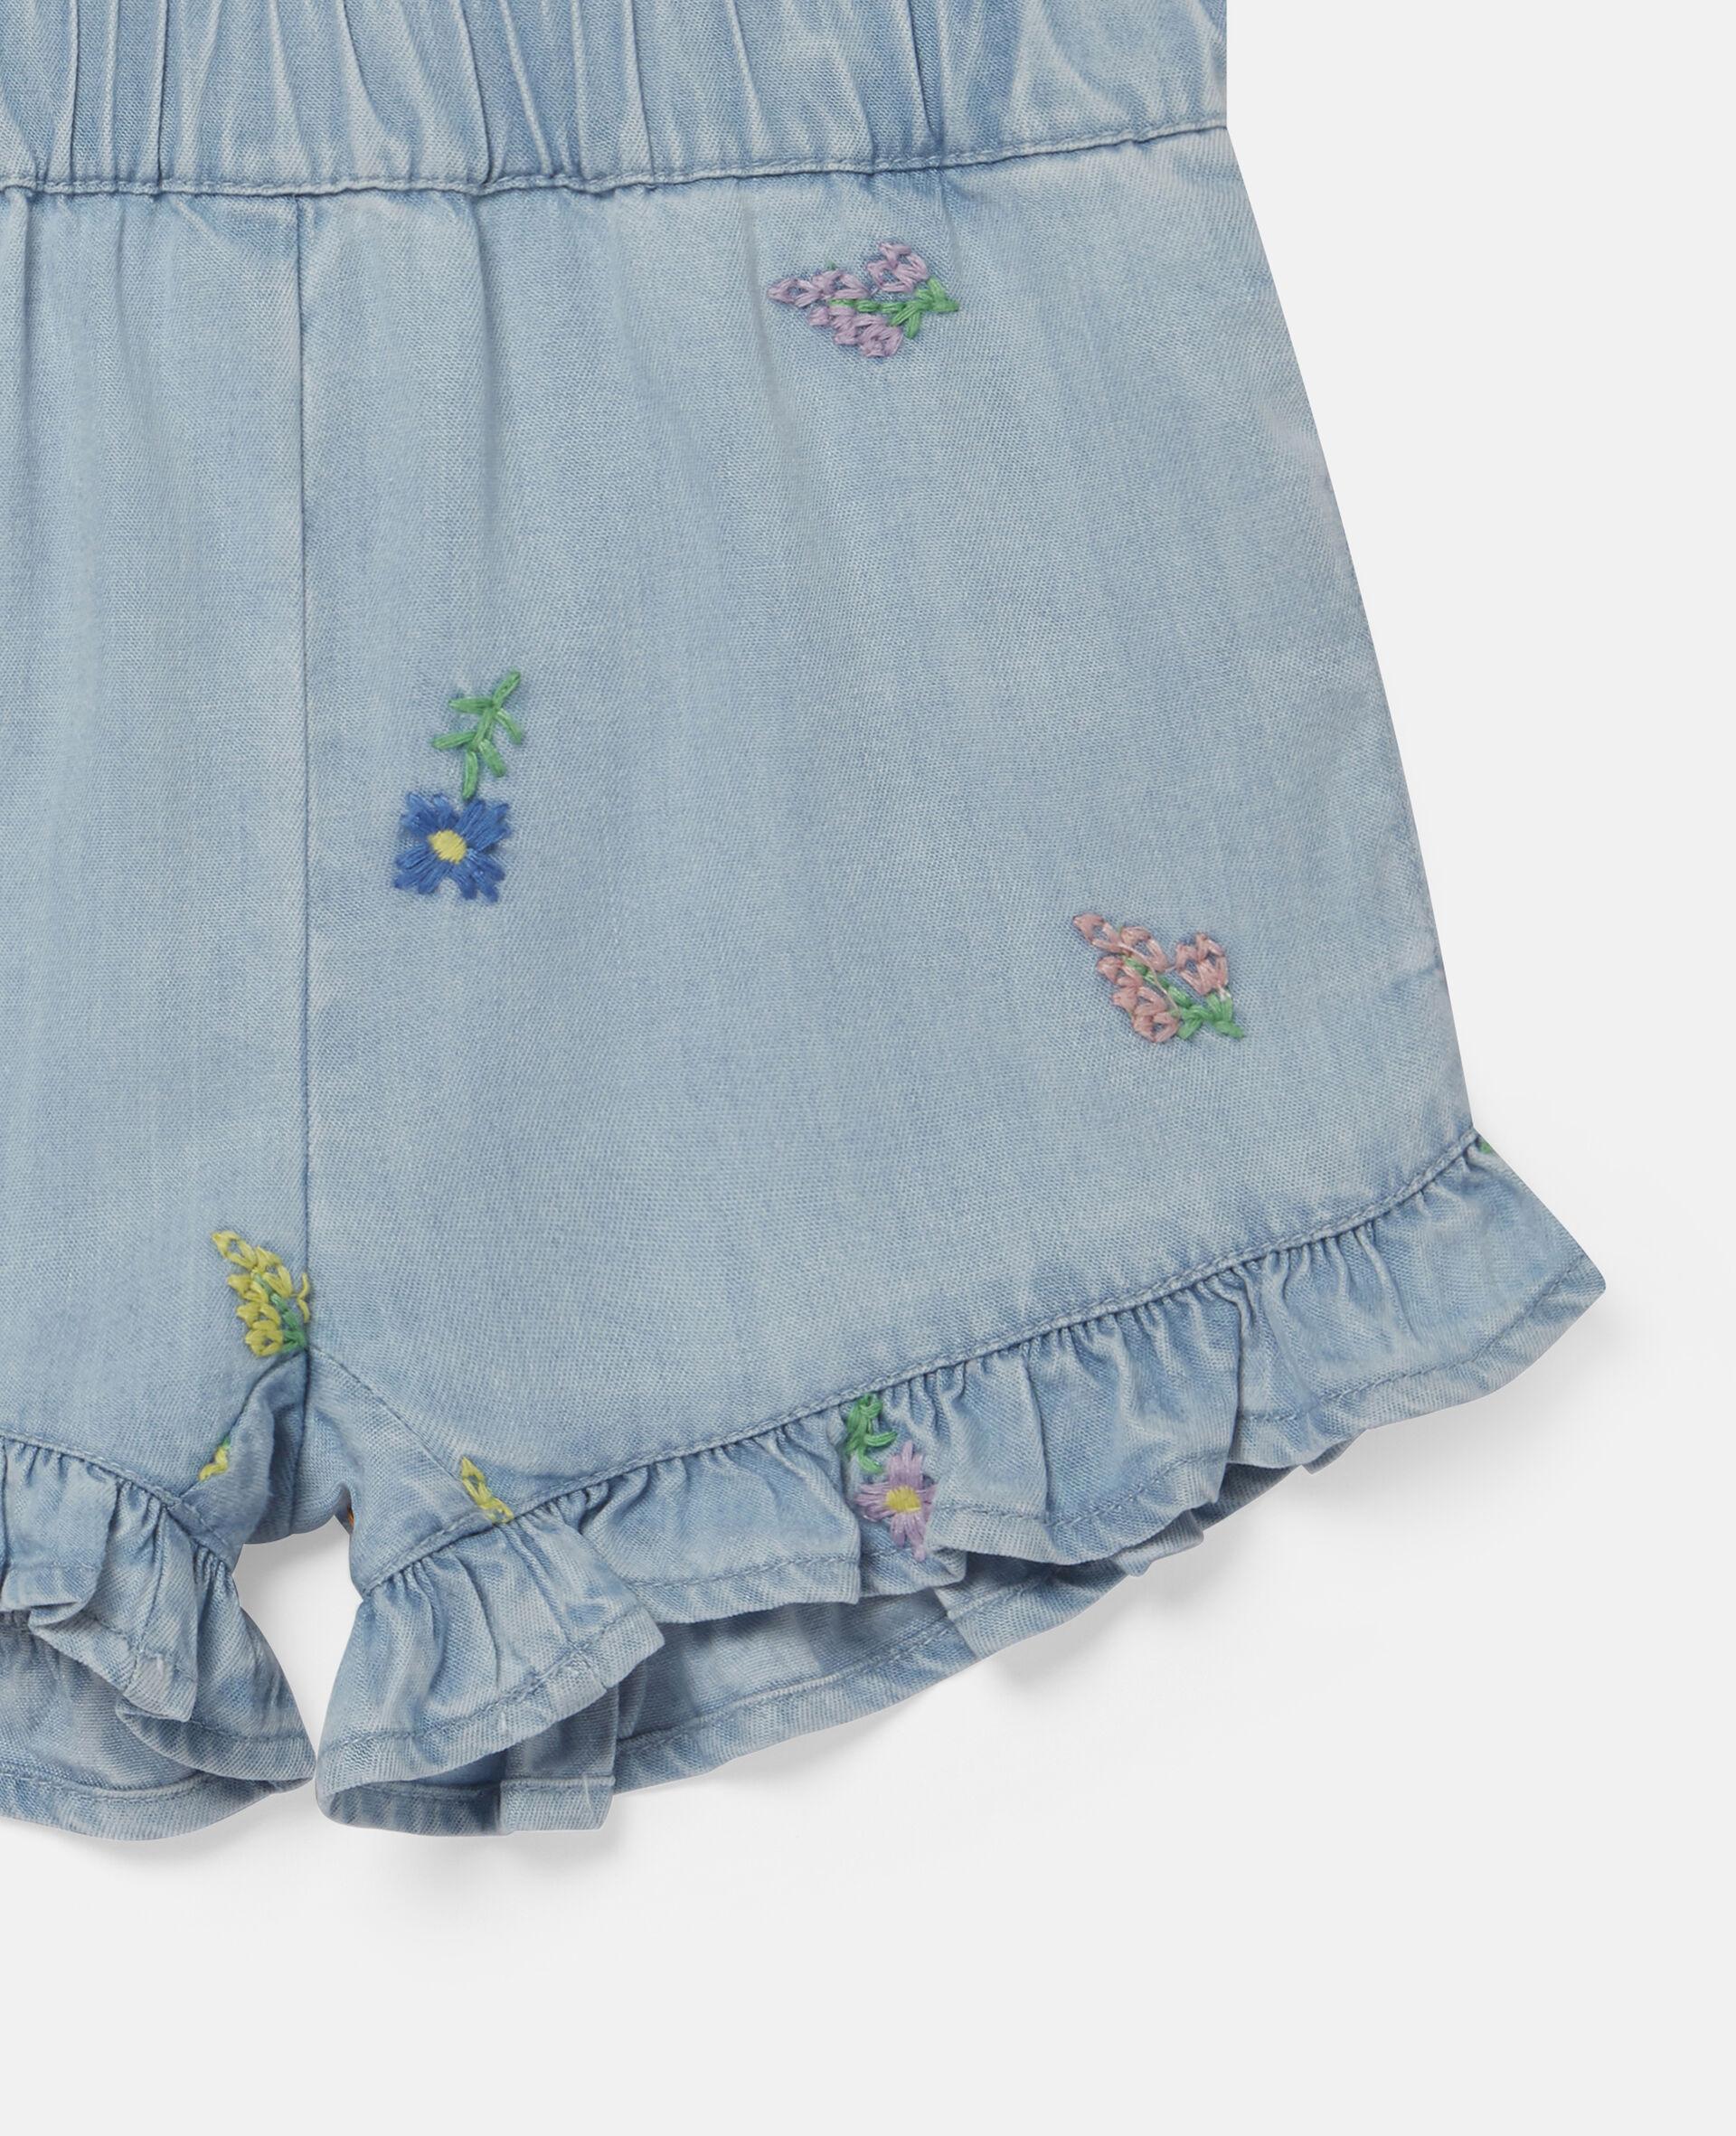 Embroidered Flowers Denim Shorts-Blue-large image number 2